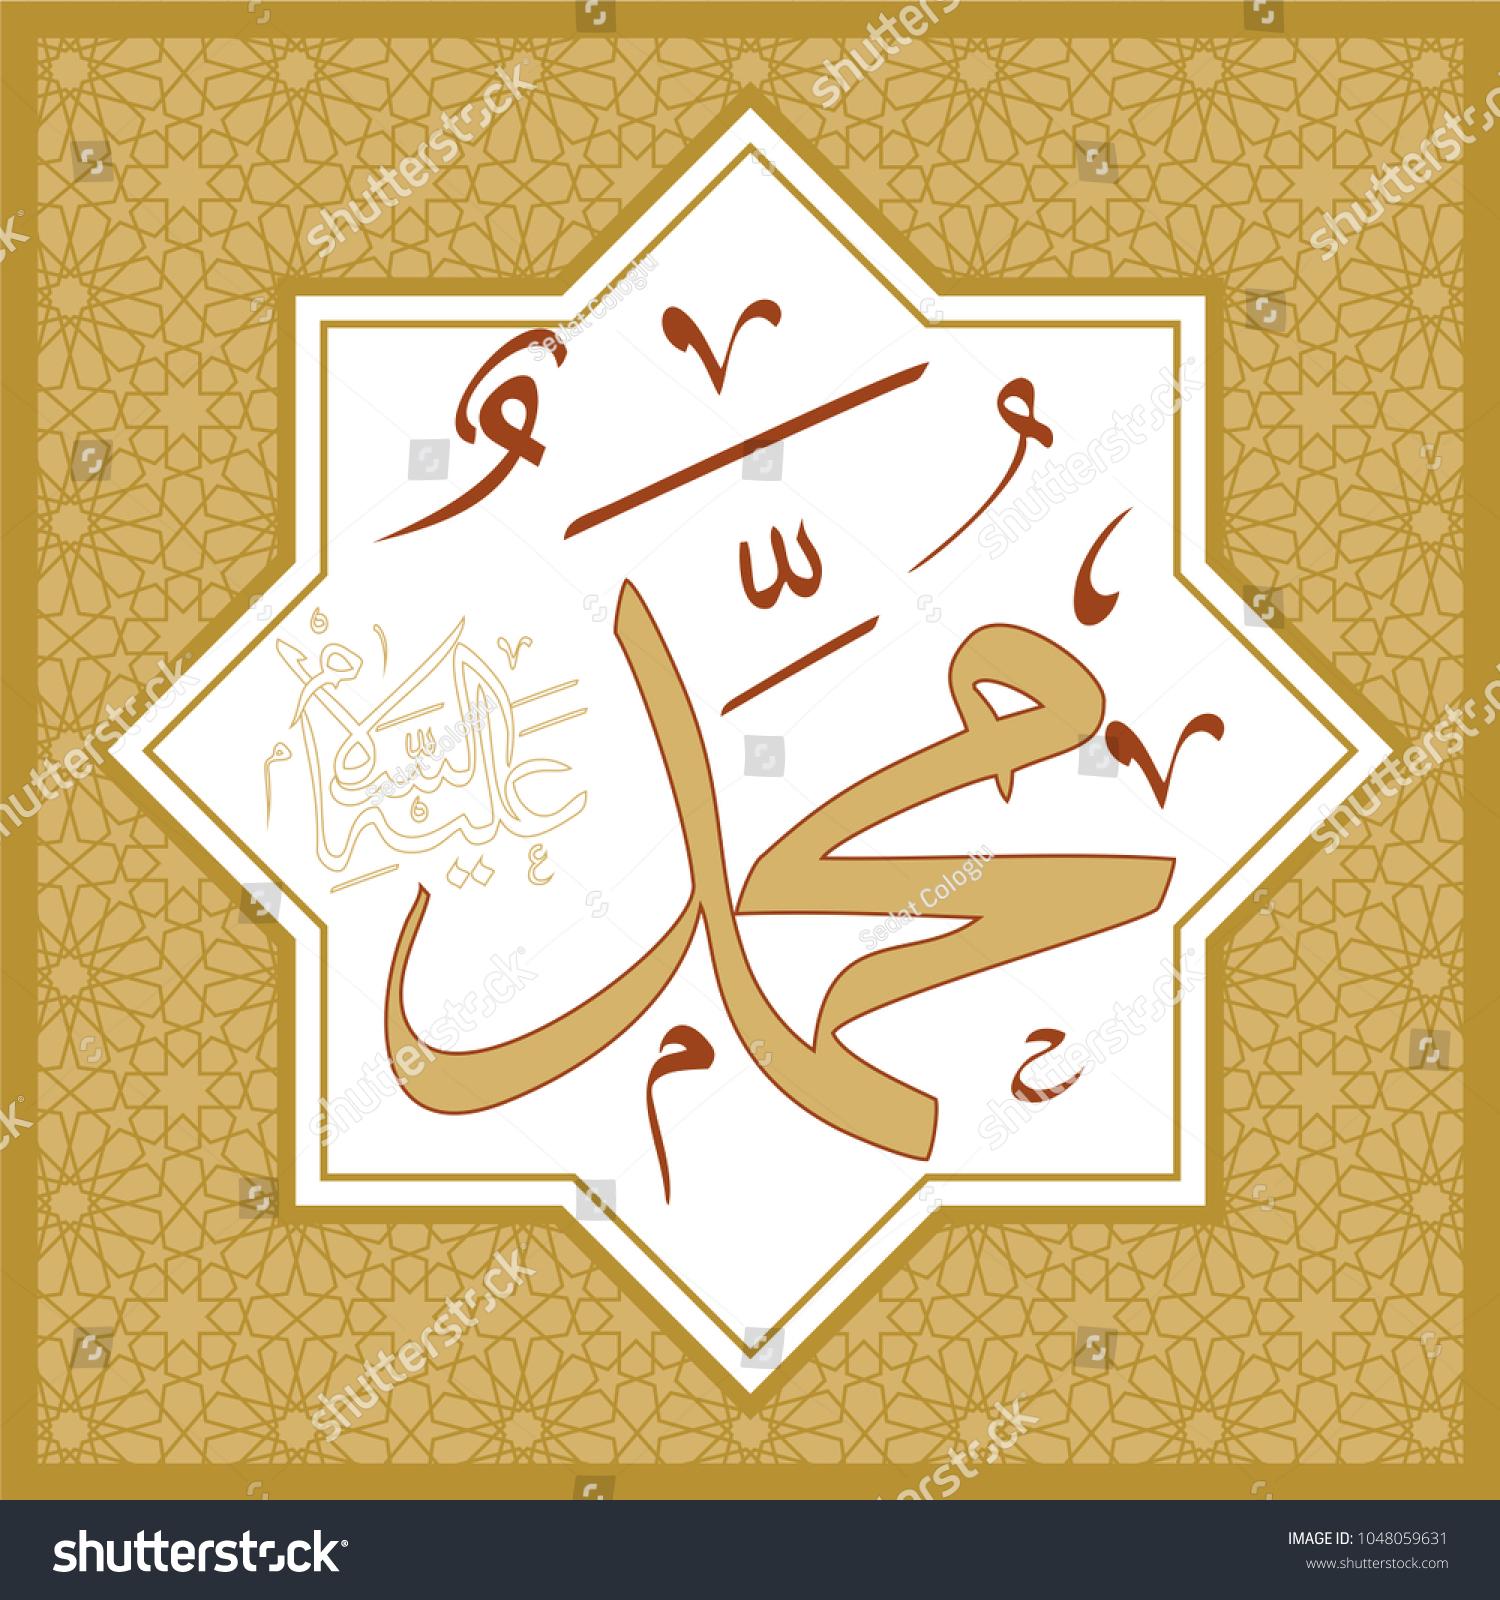 Prophet Muhammad Name Written Wall Table Stock Photo (Photo, Vector ...